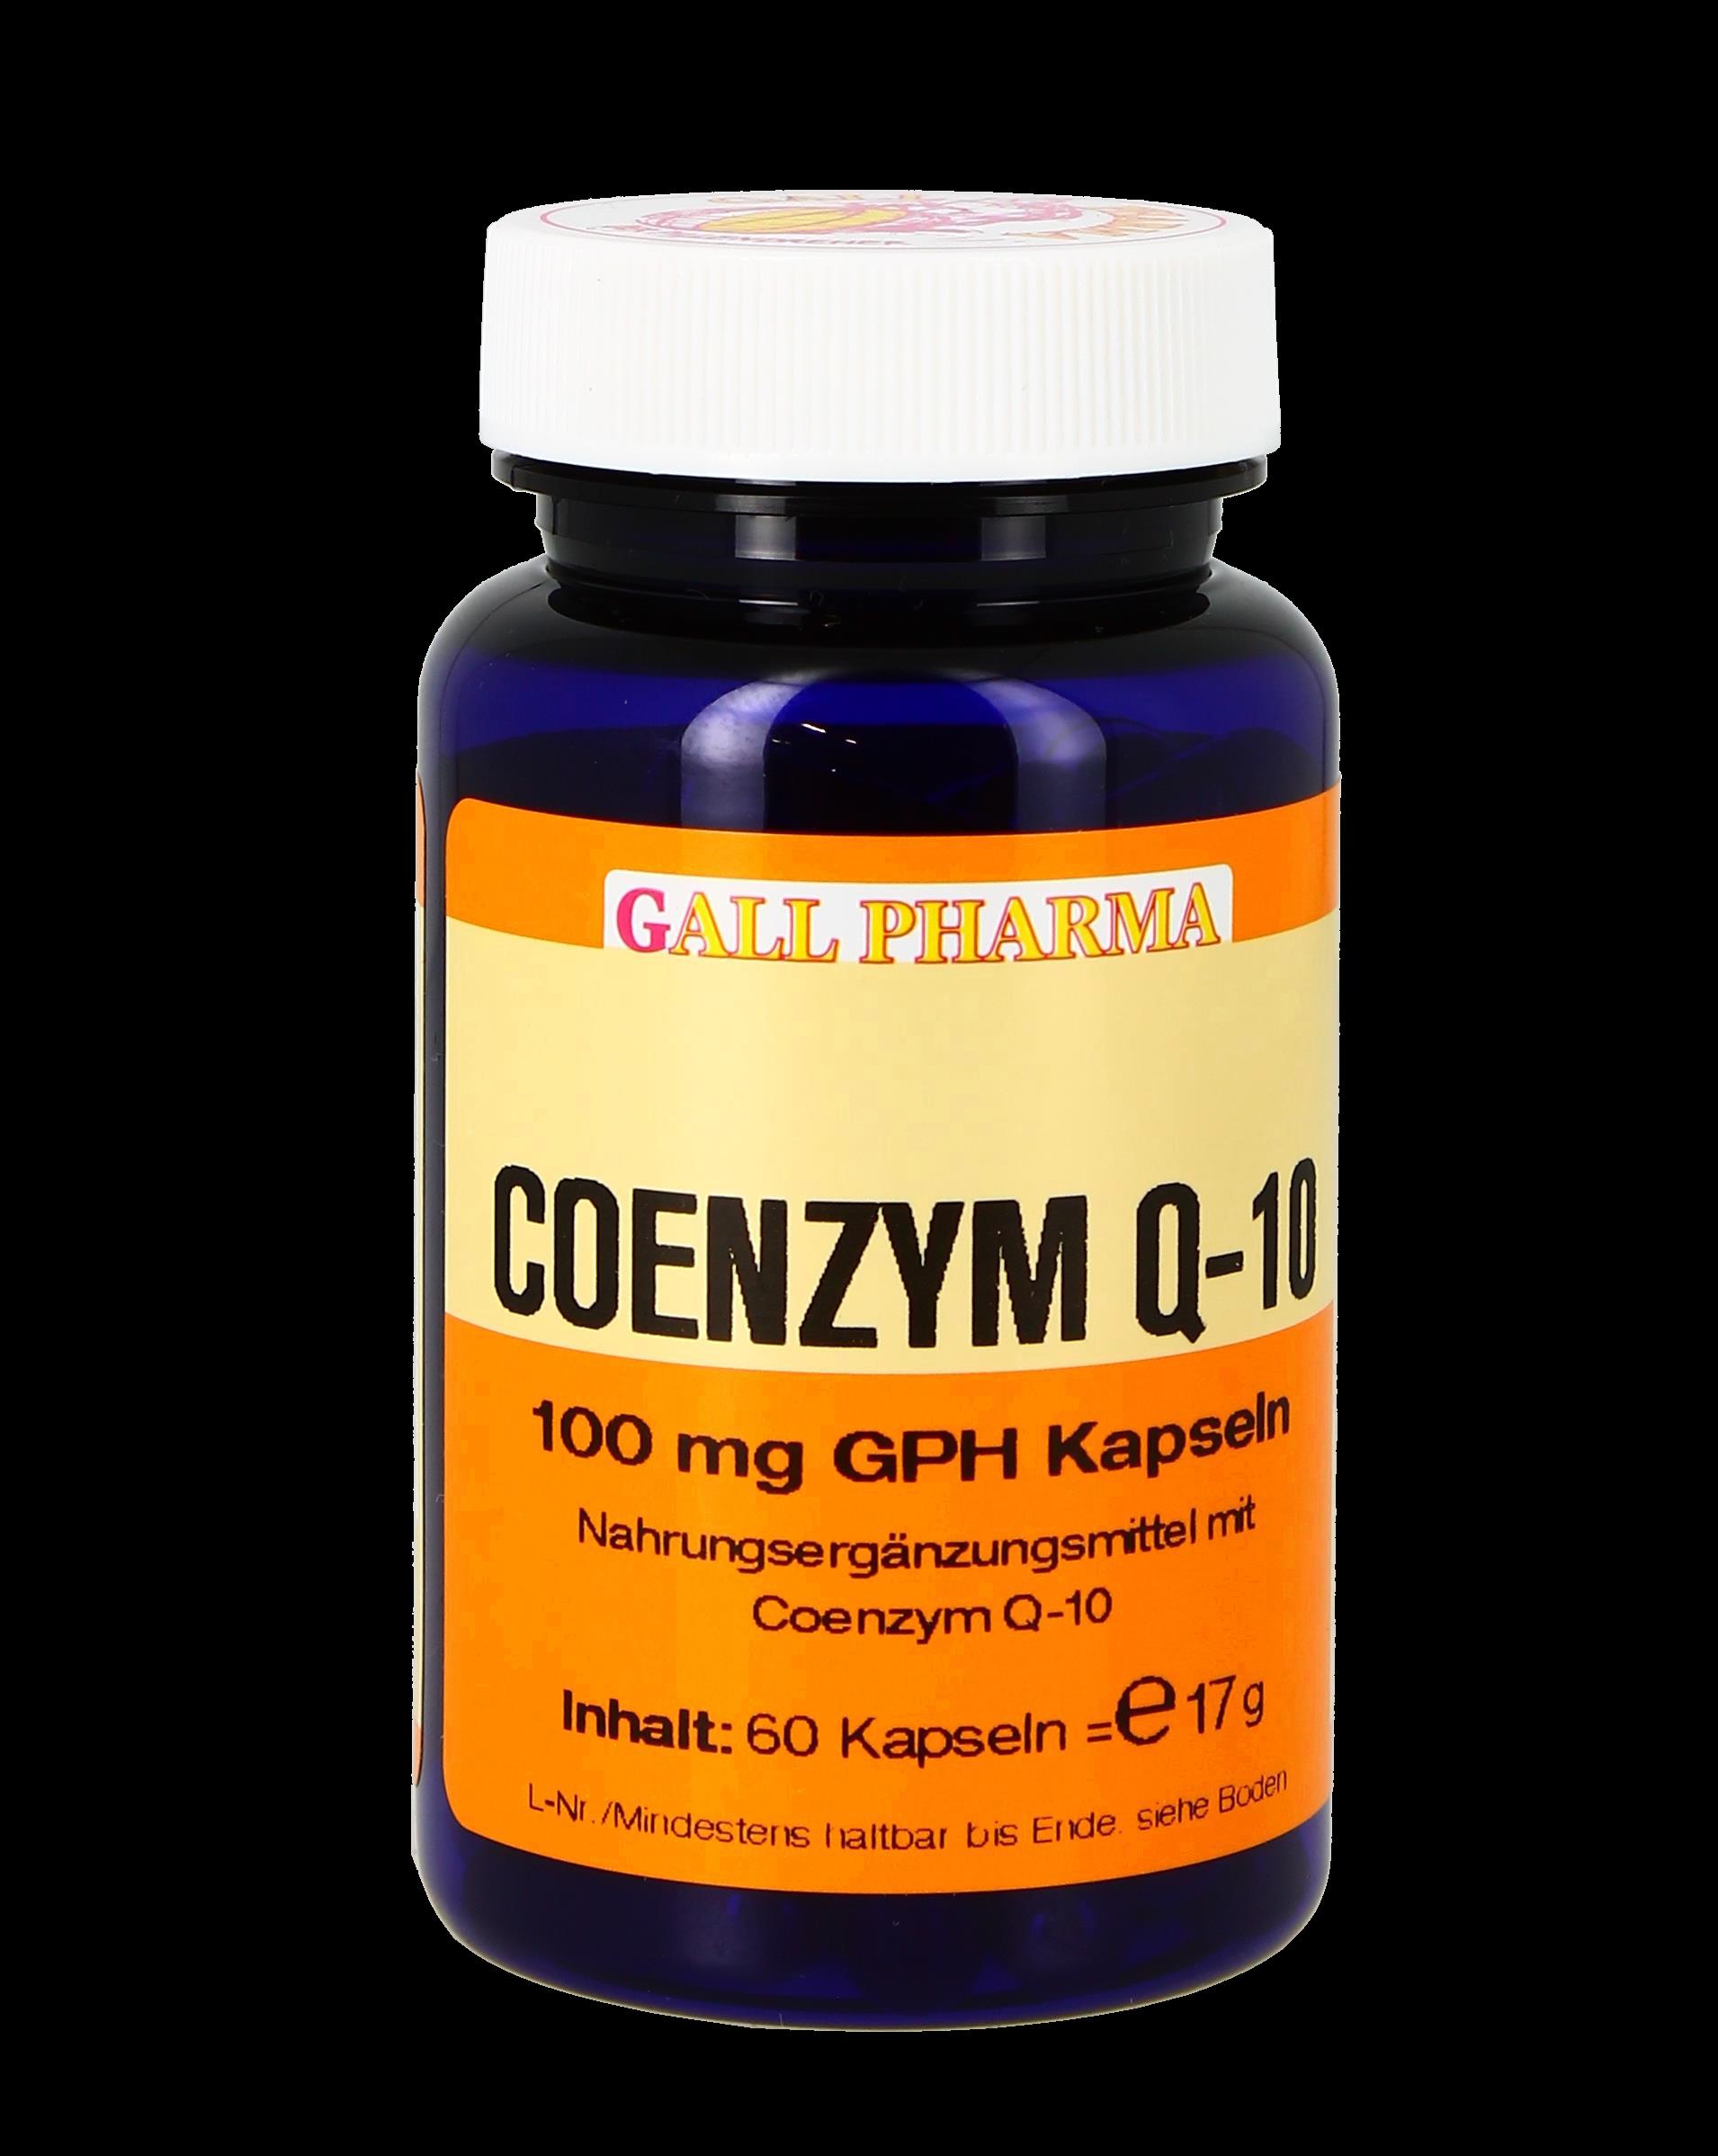 Coenzym Q-10 100 mg GPH Kapseln